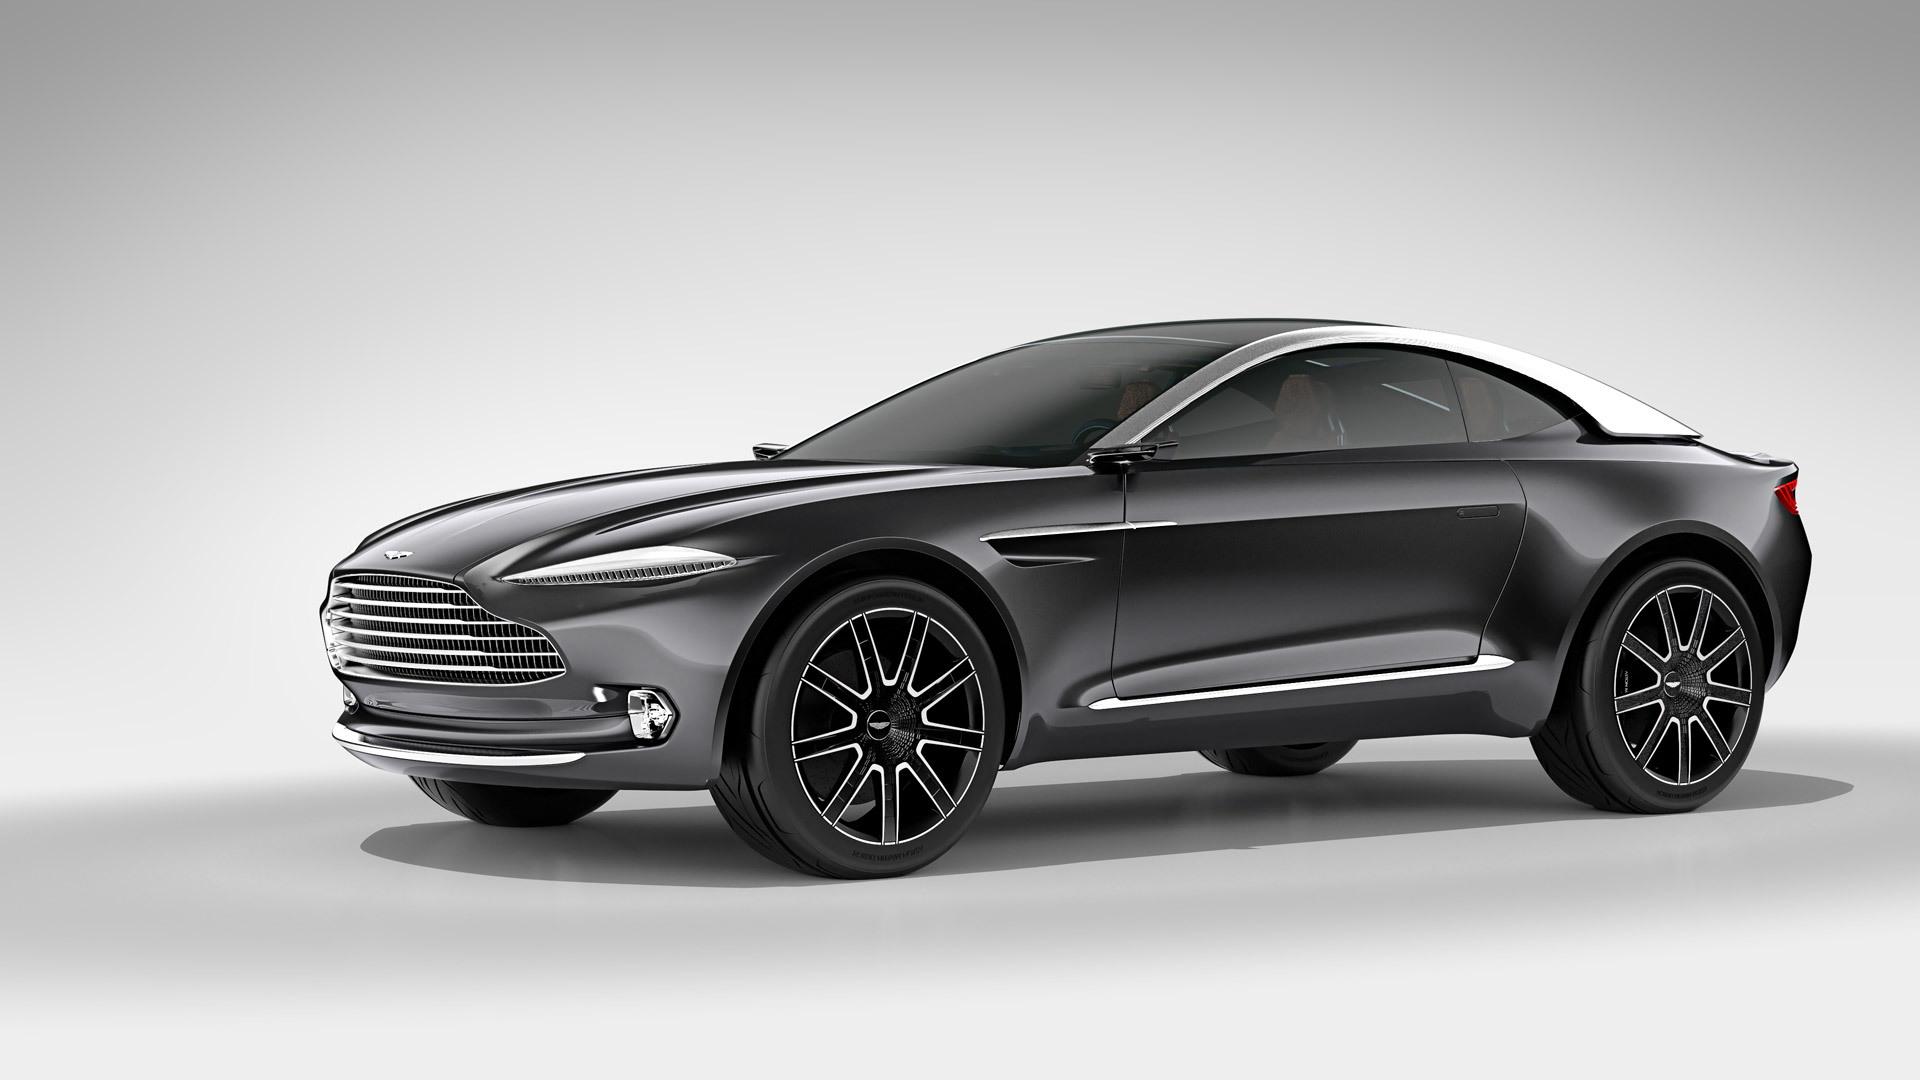 Aston Martin DBX concept, 2015 Geneva Motor Show